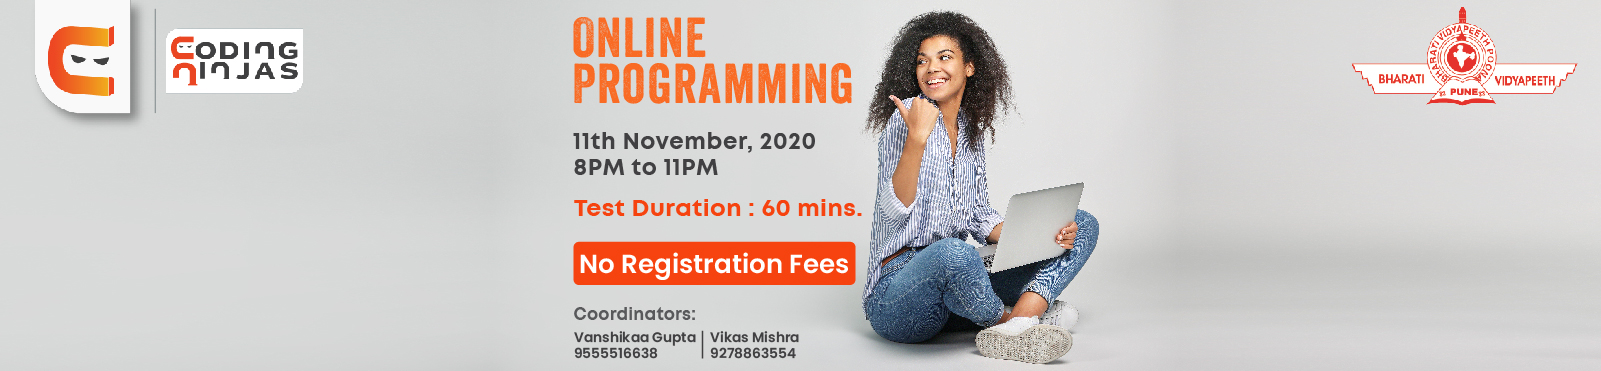 Online Programming -BVICAM